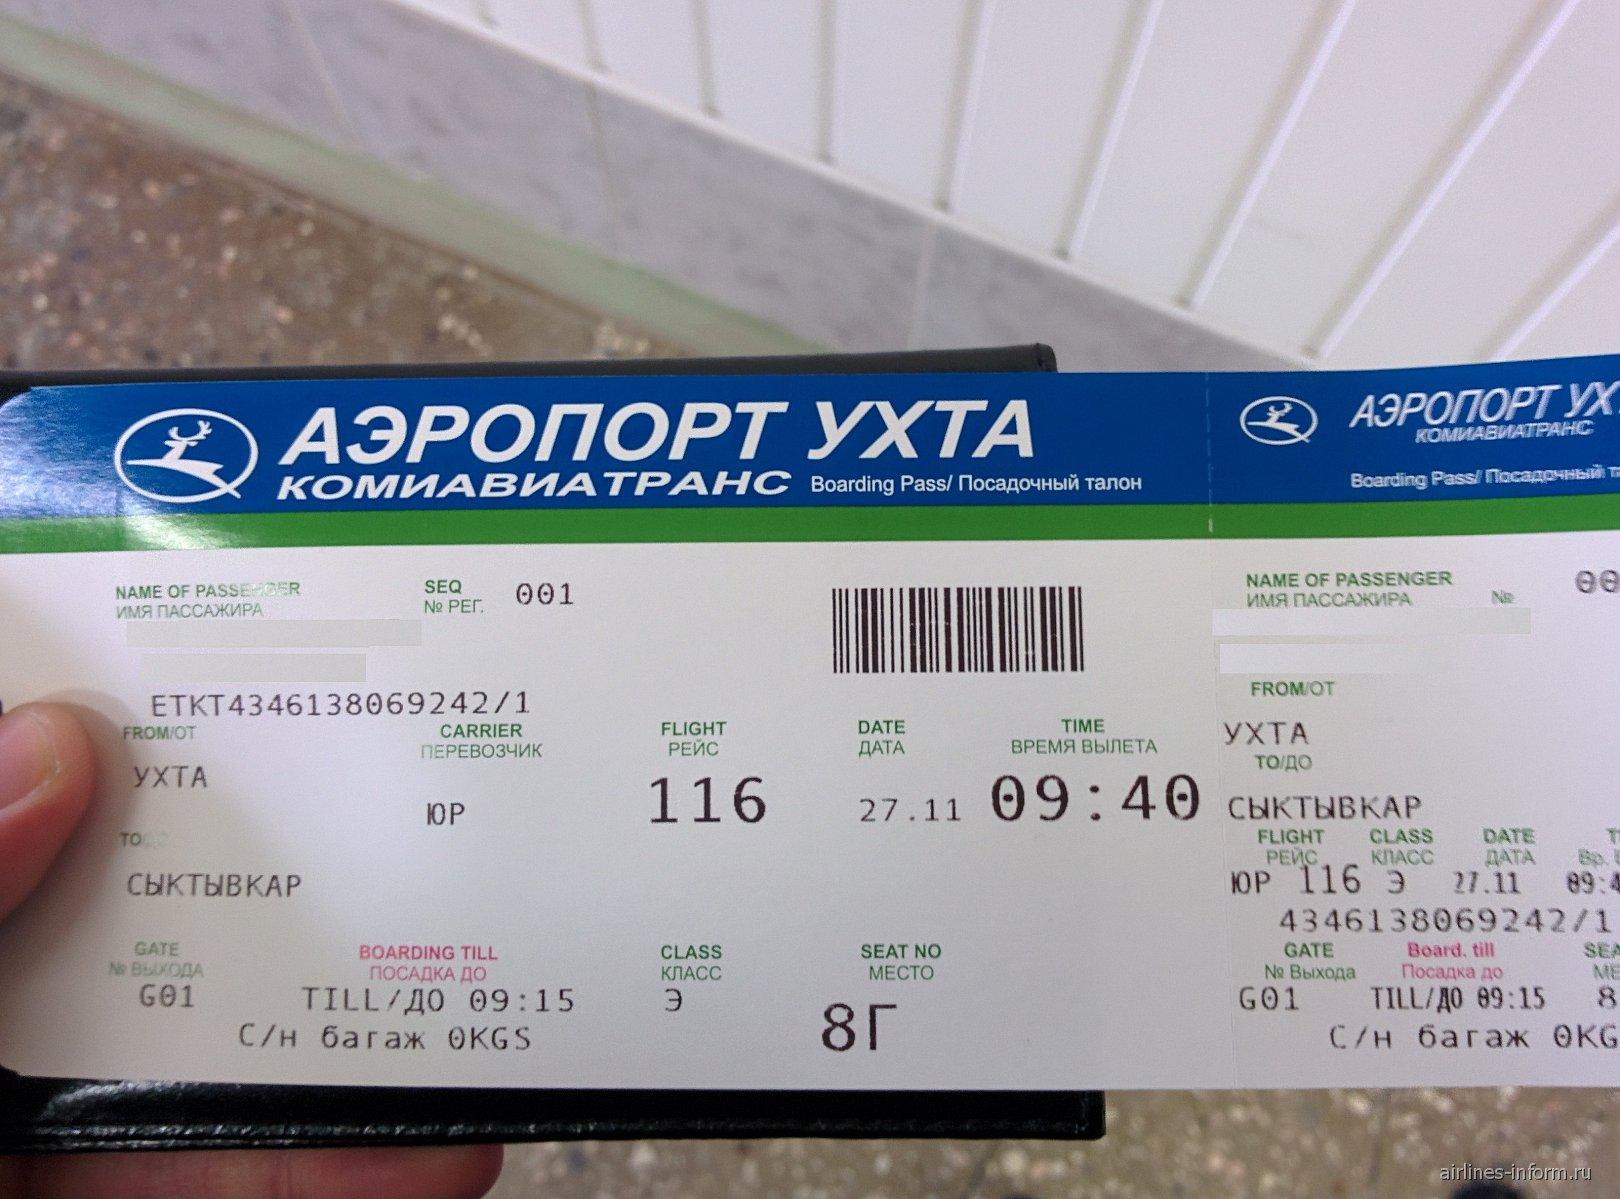 Посадочный талон на рейс Ухта-Сыктывкар